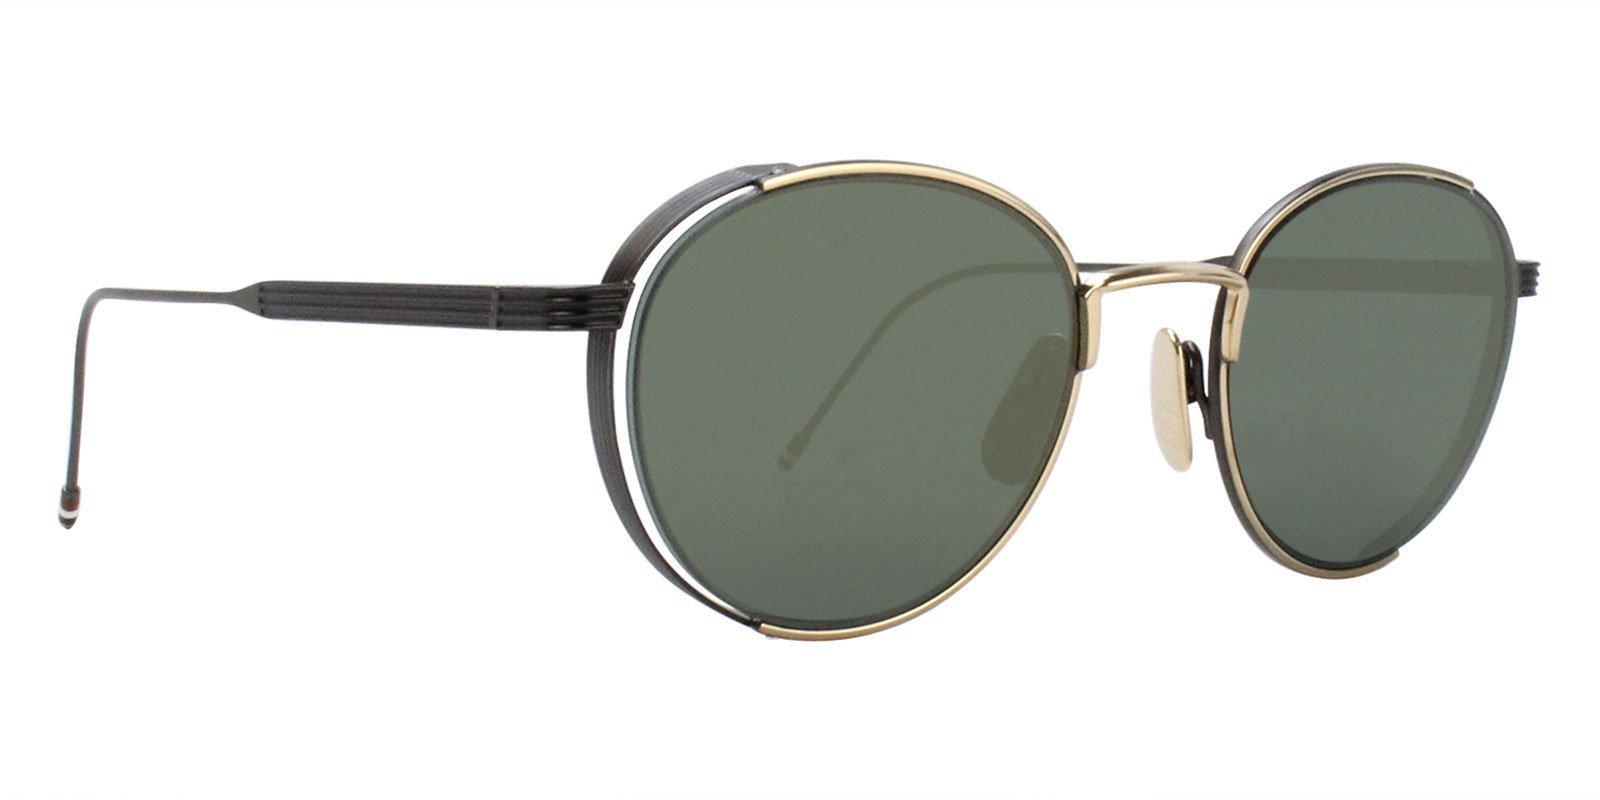 5361793ee48b Thom Browne - TB-106-D Gold Black - Green-sunglasses-Designer Eyes ...